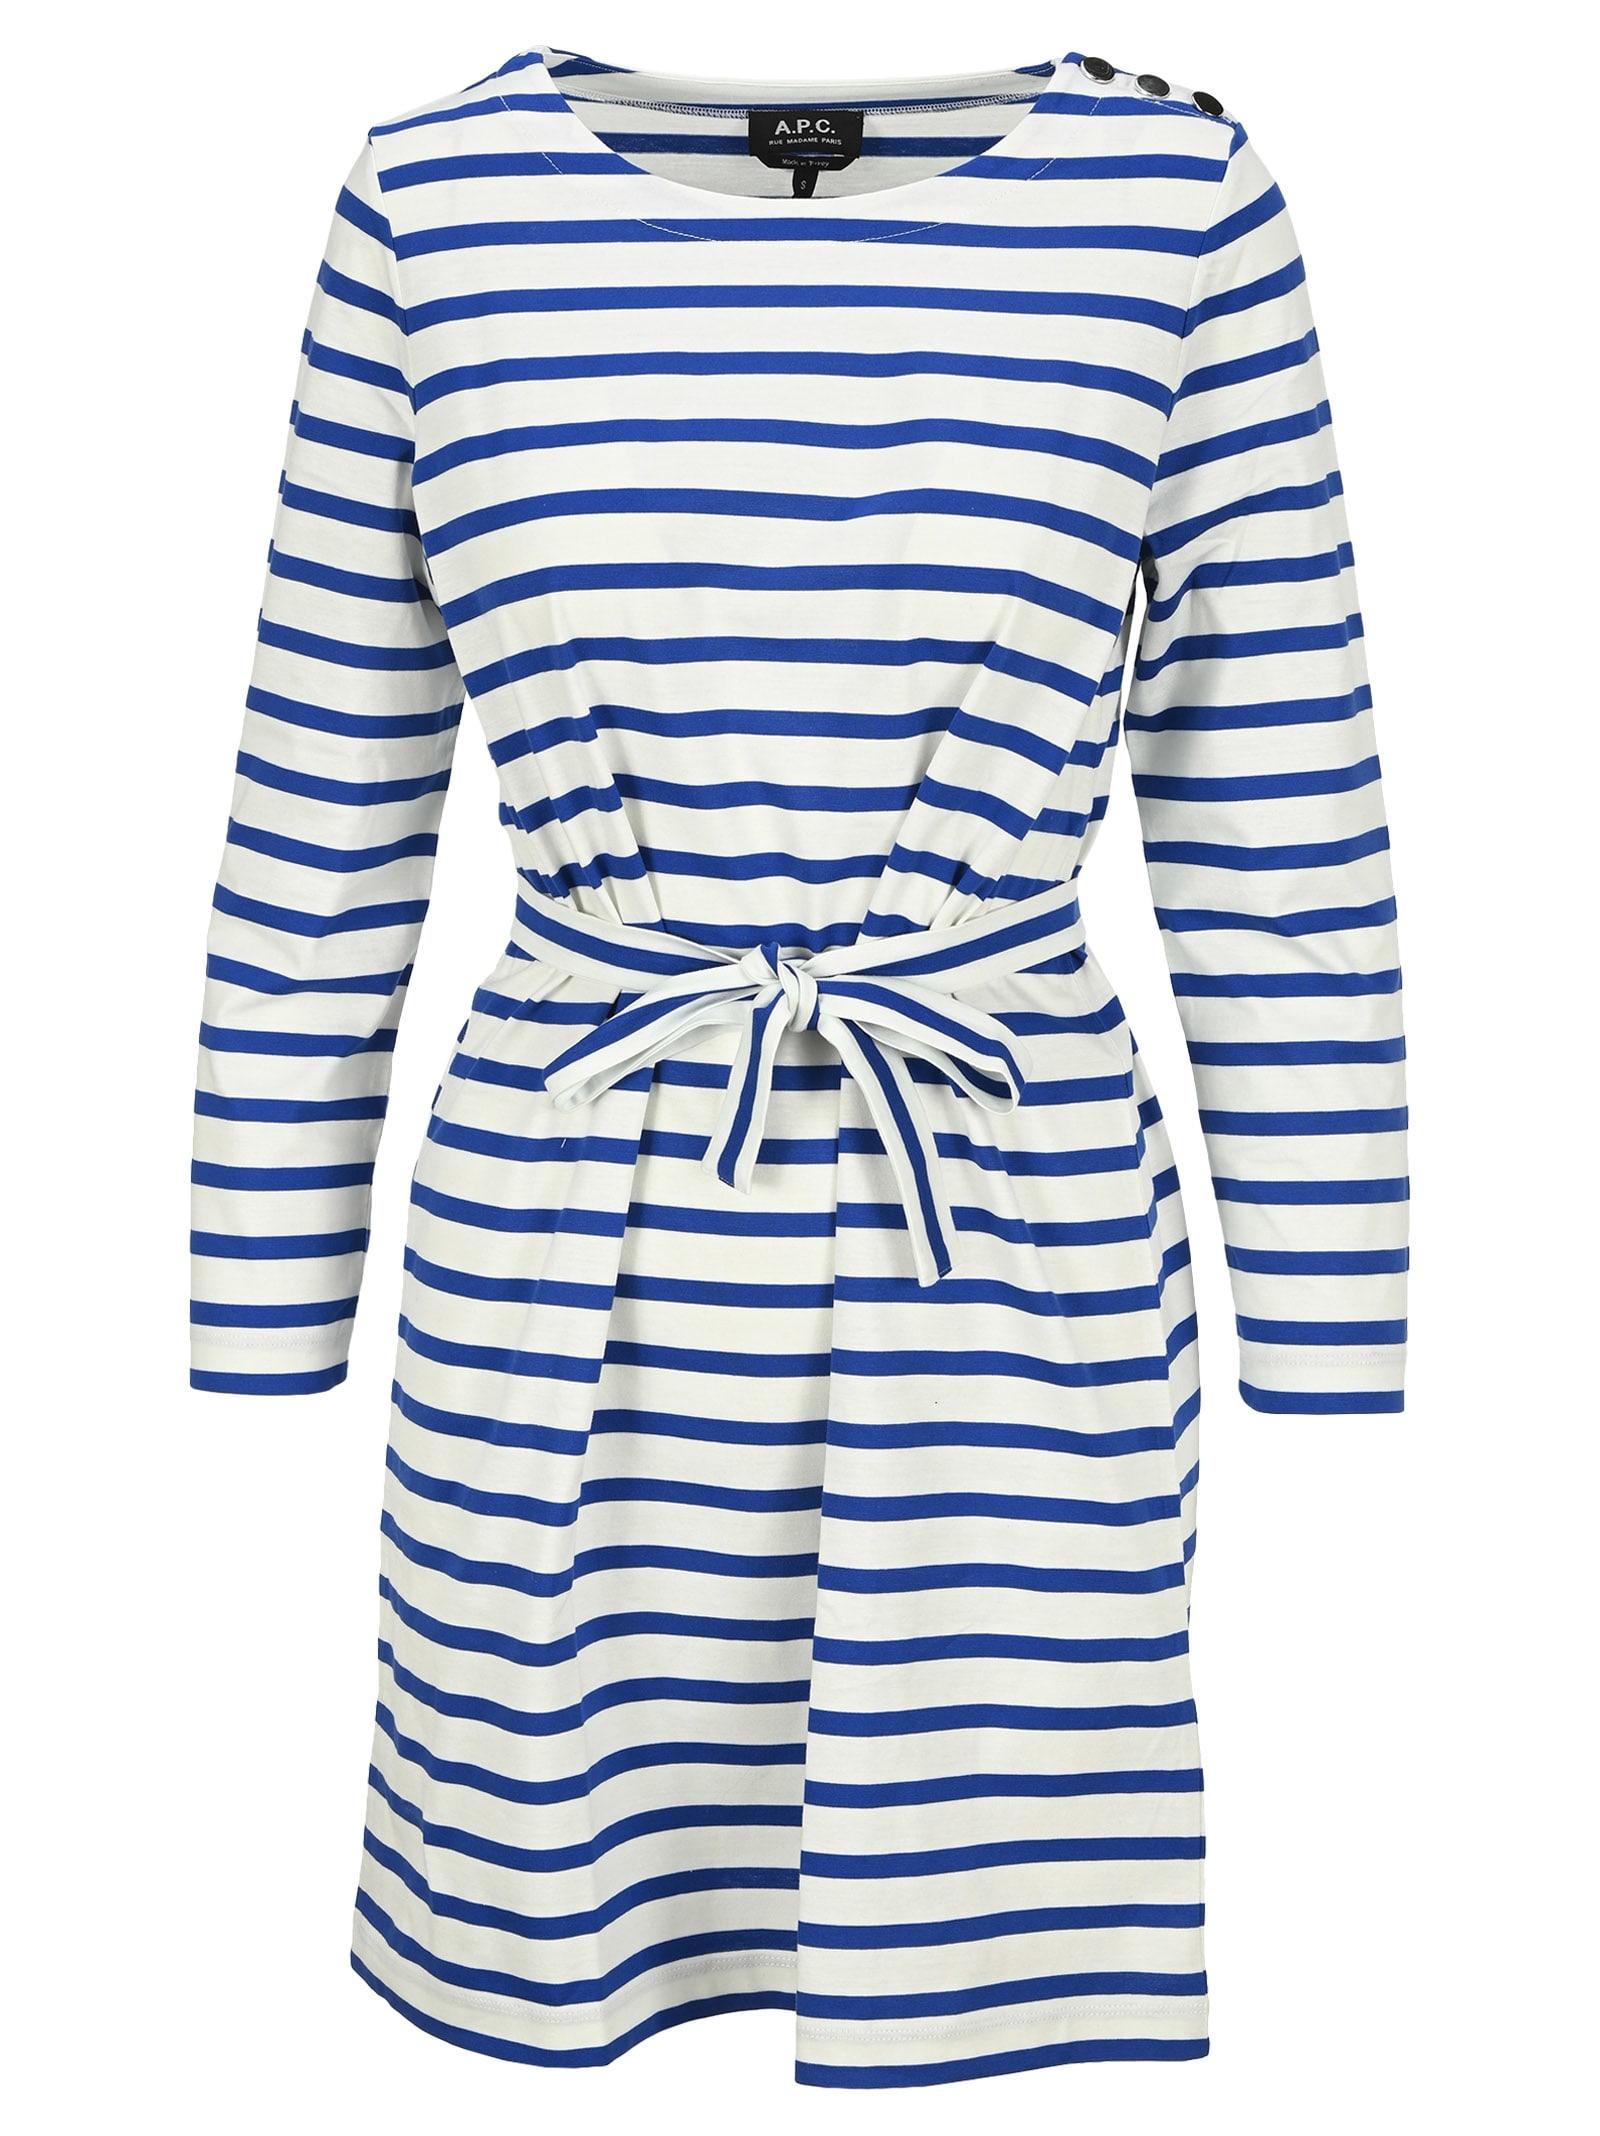 A.p.c. Midi dresses A.P.C. FLORENCE DRESS